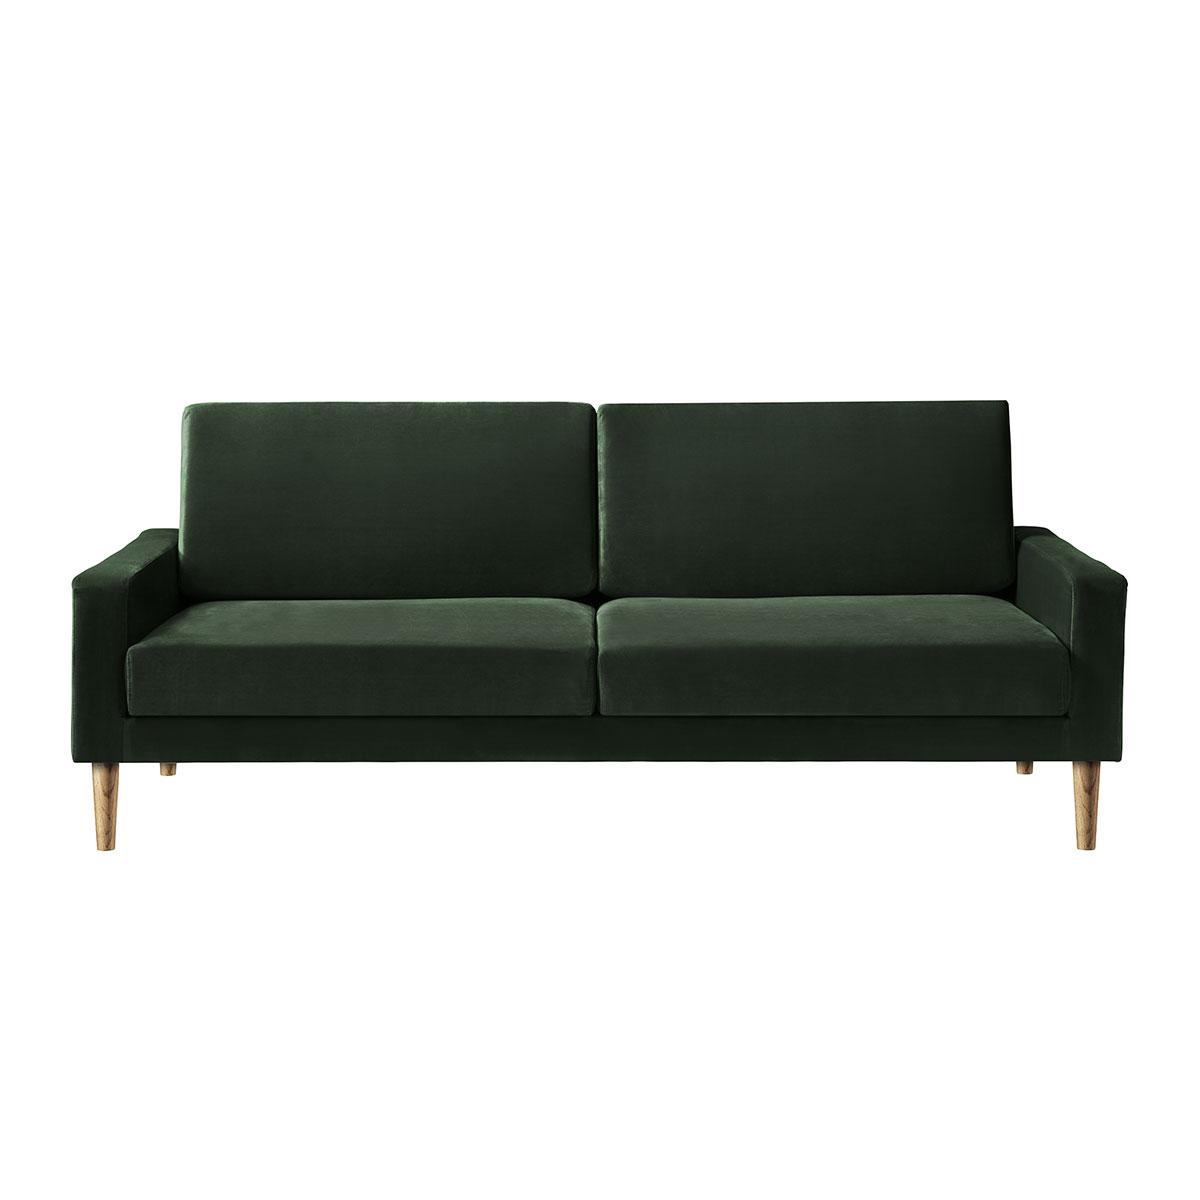 Living&more 3 pers. sofa - Viktoria - Mørkegrøn